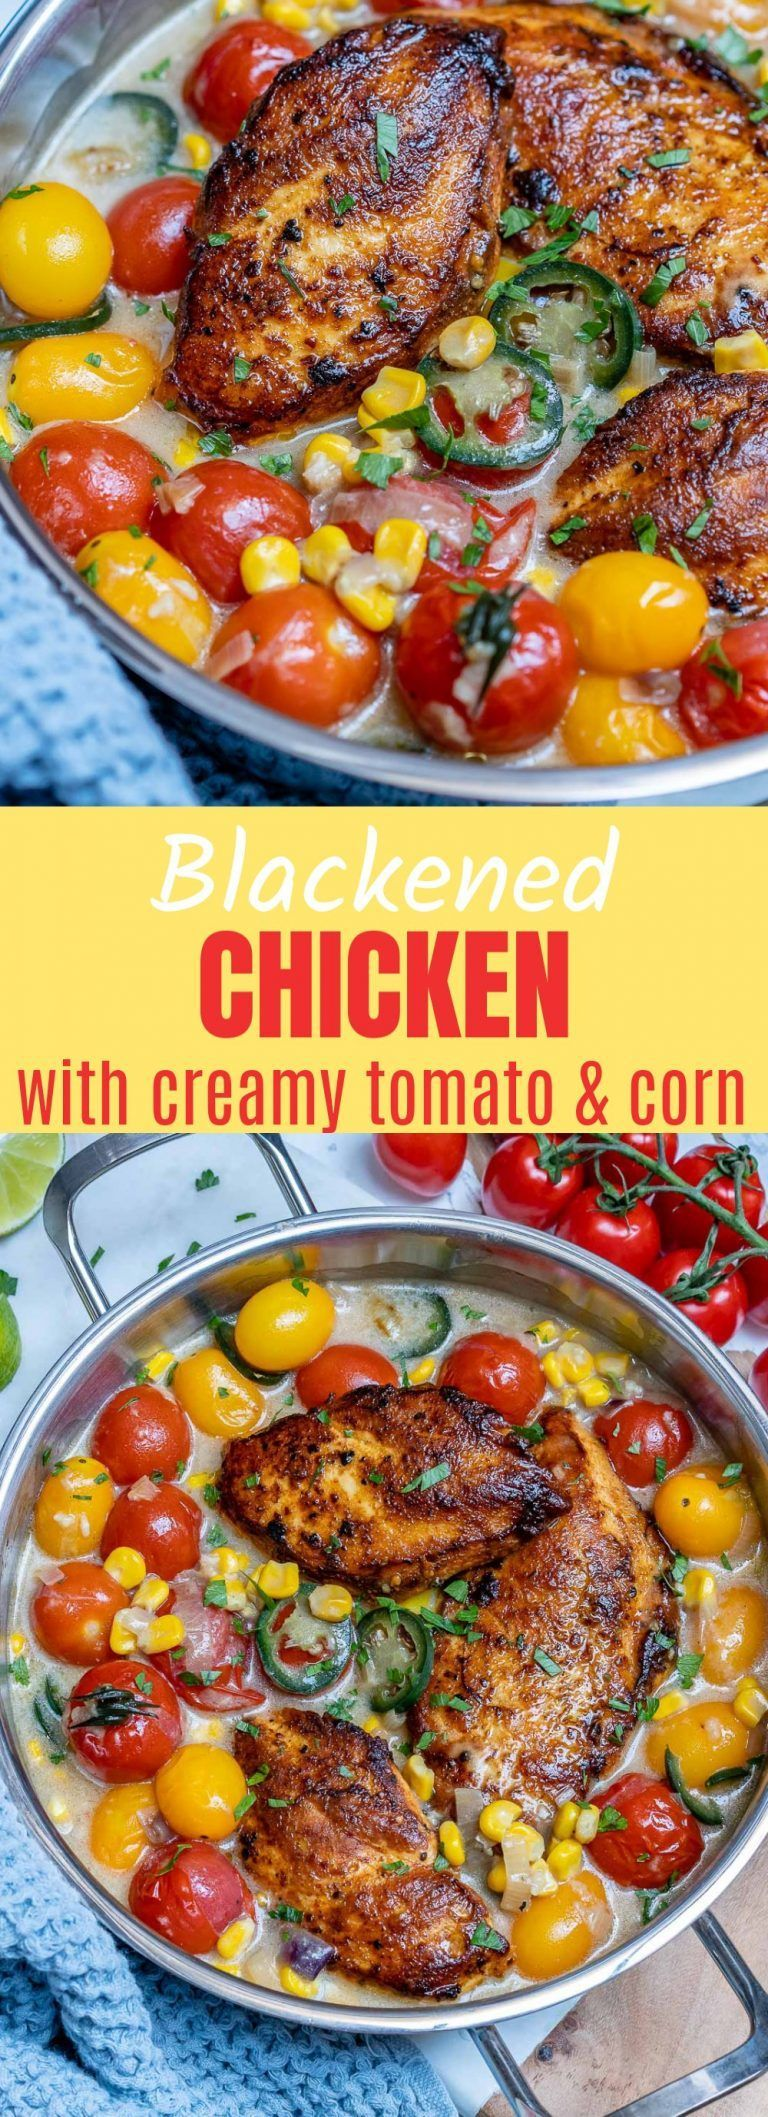 Blackened Chicken with Creamy Corn + Ripe Cherry Tomatoes #blackenedchicken Blackened Chicken with Creamy Corn + Ripe Cherry Tomatoes! | Clean Food Crush #blackenedchicken